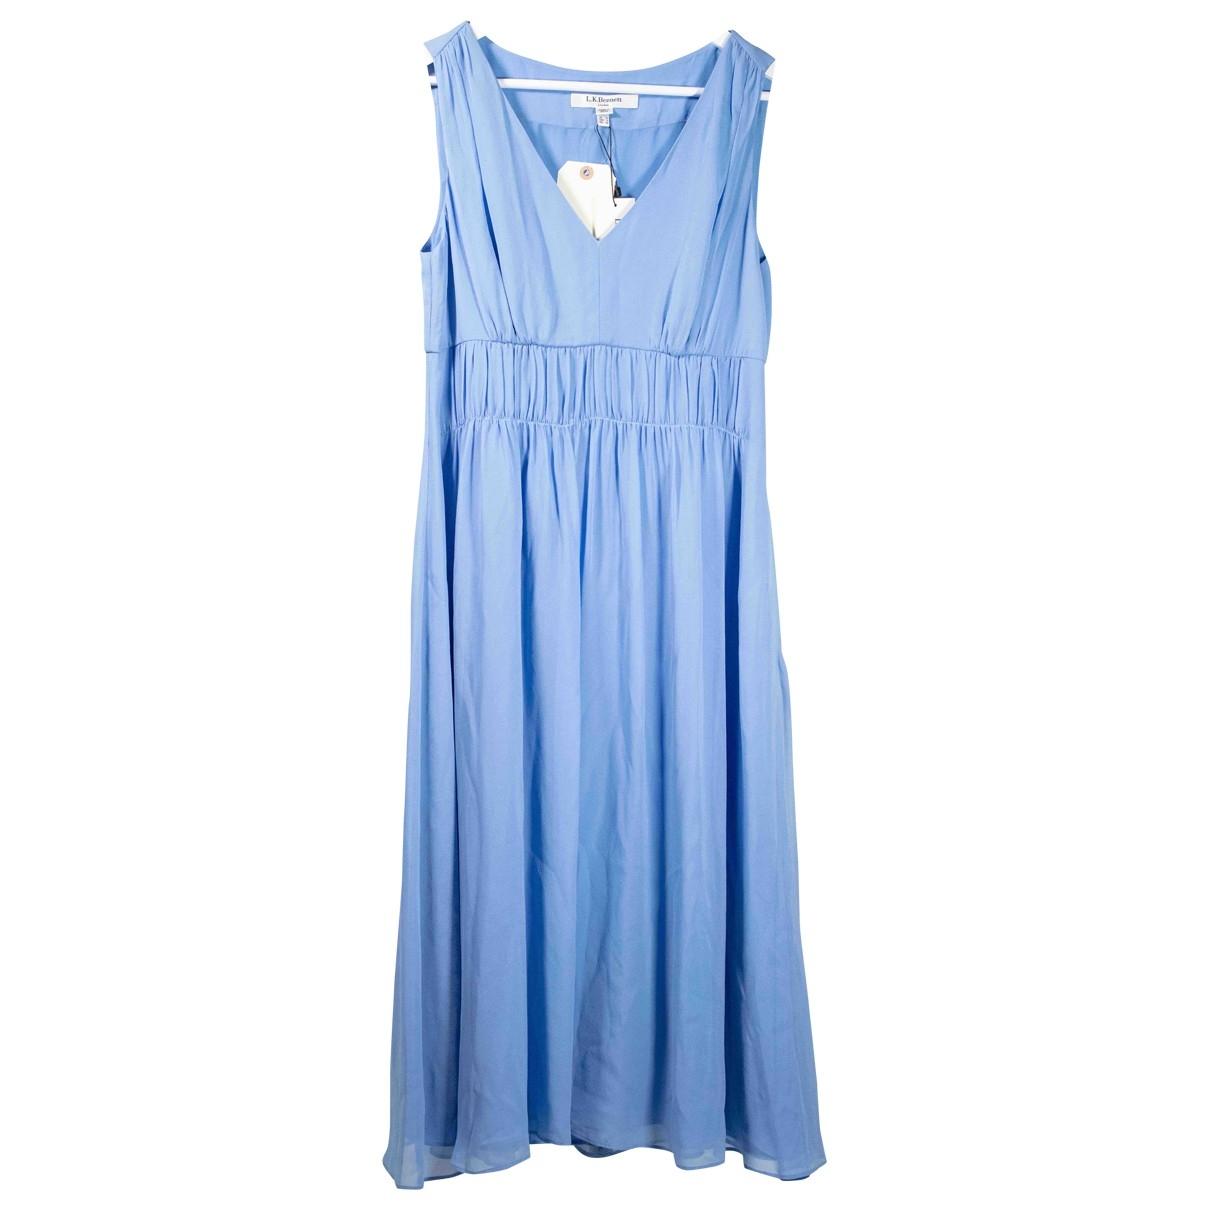 Lk Bennett - Robe   pour femme en soie - bleu